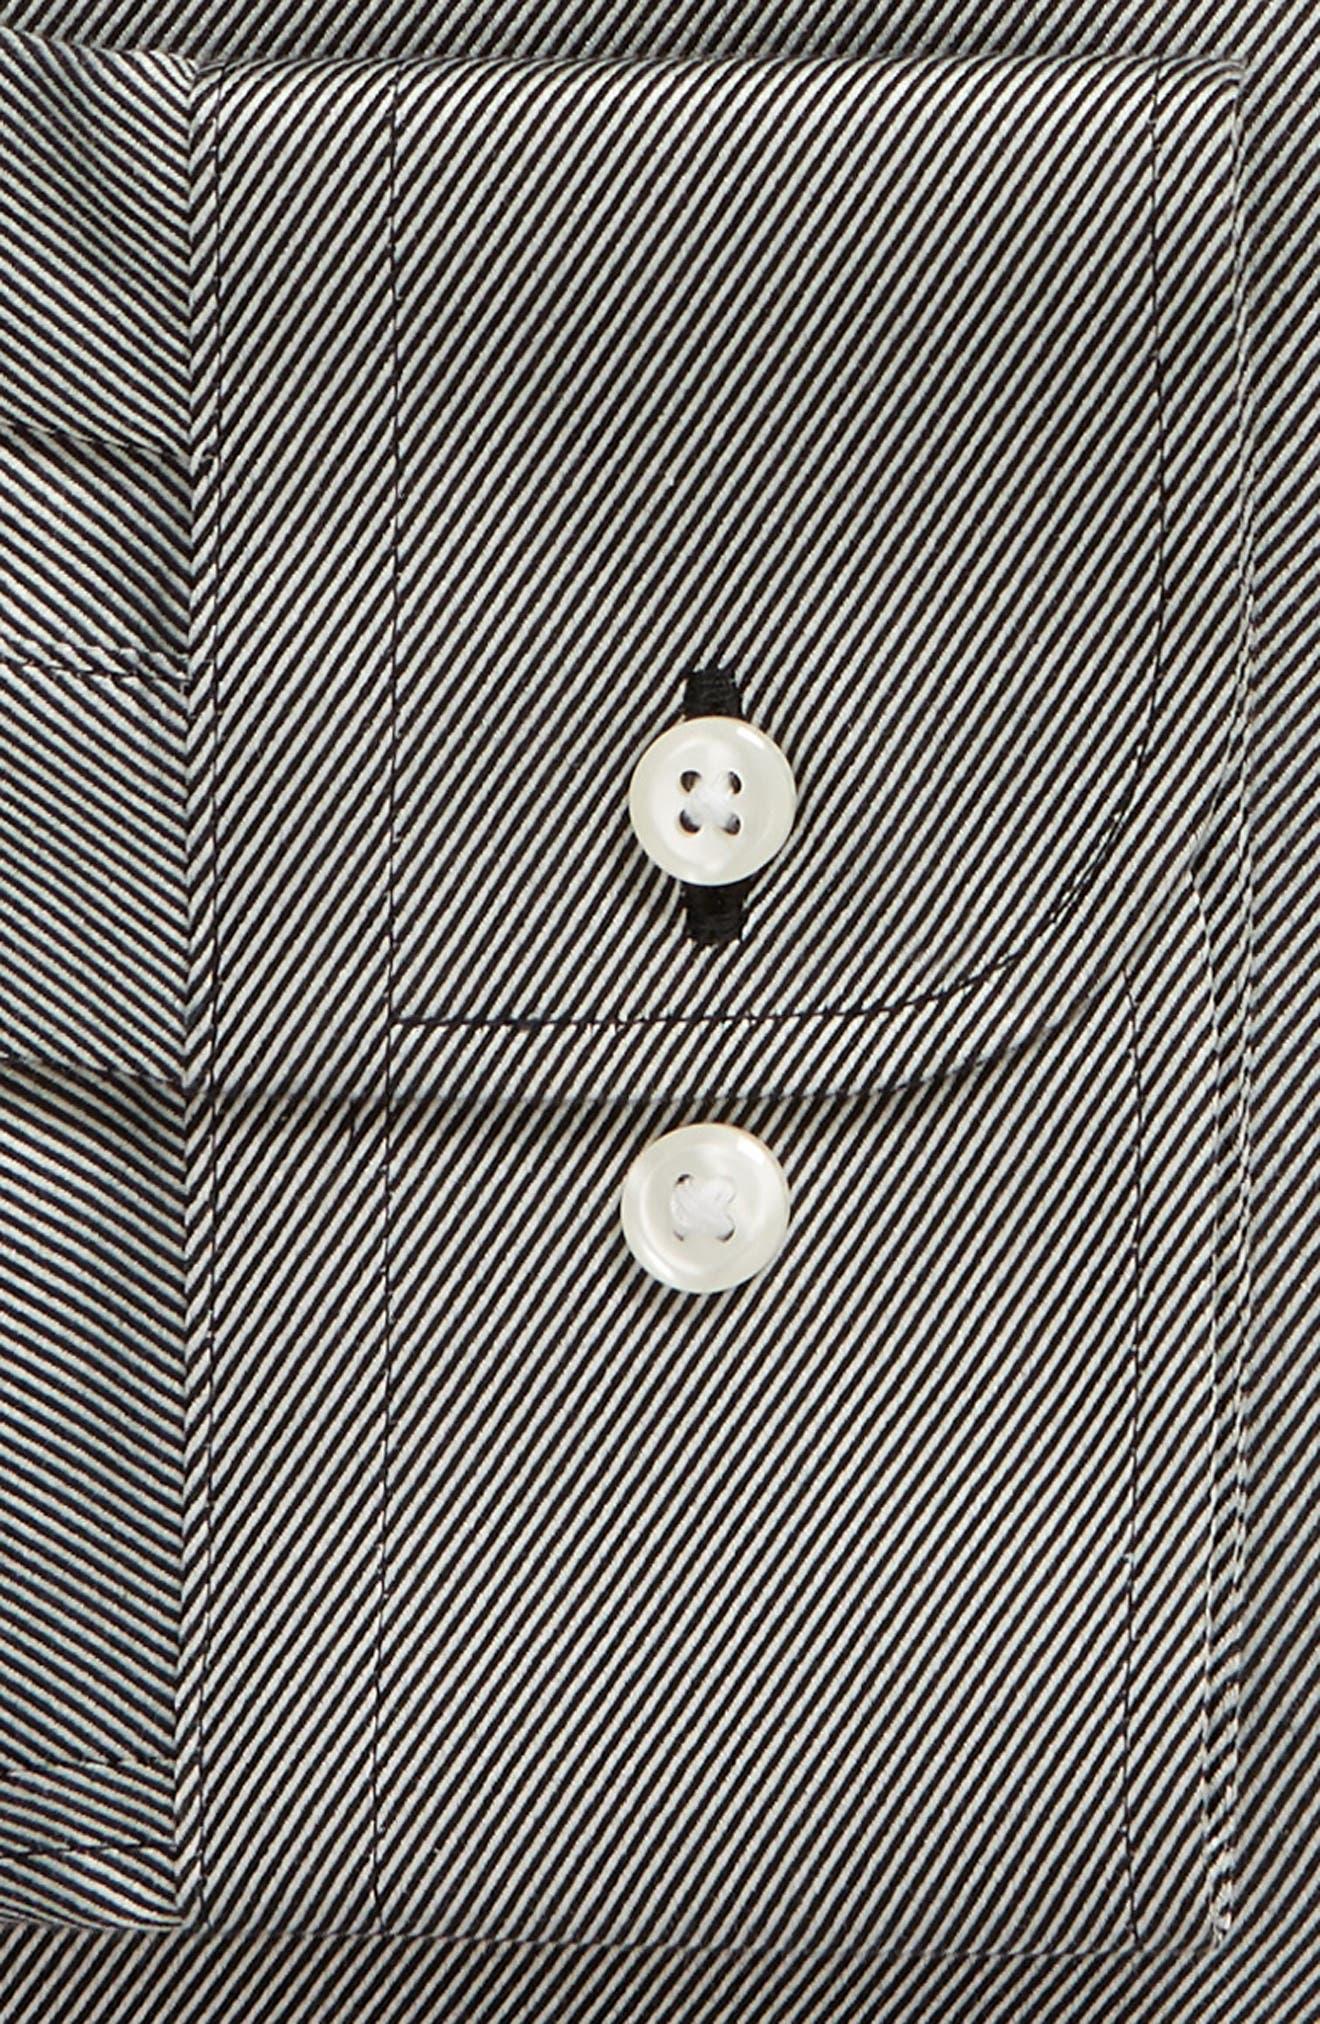 Trim Fit Twill Dress Shirt,                             Alternate thumbnail 6, color,                             001